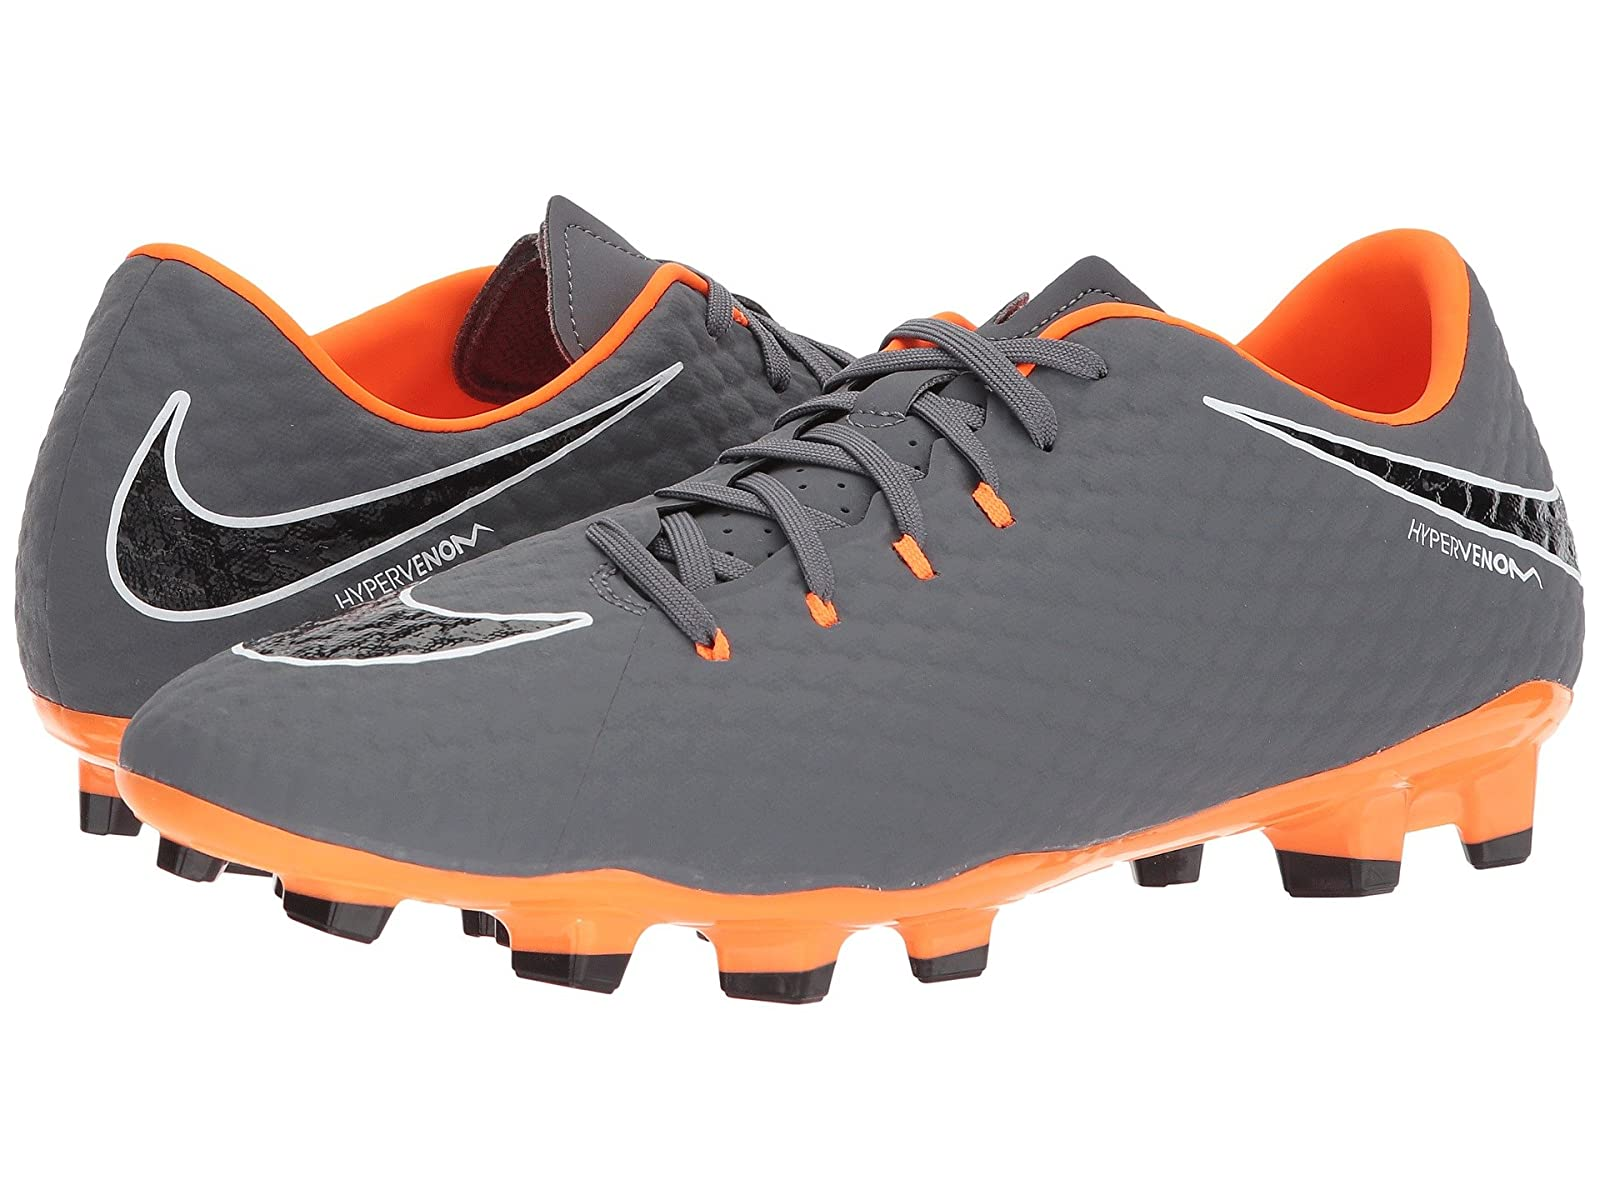 Nike Hypervenom Phantom 3 Academy FGCheap and distinctive eye-catching shoes